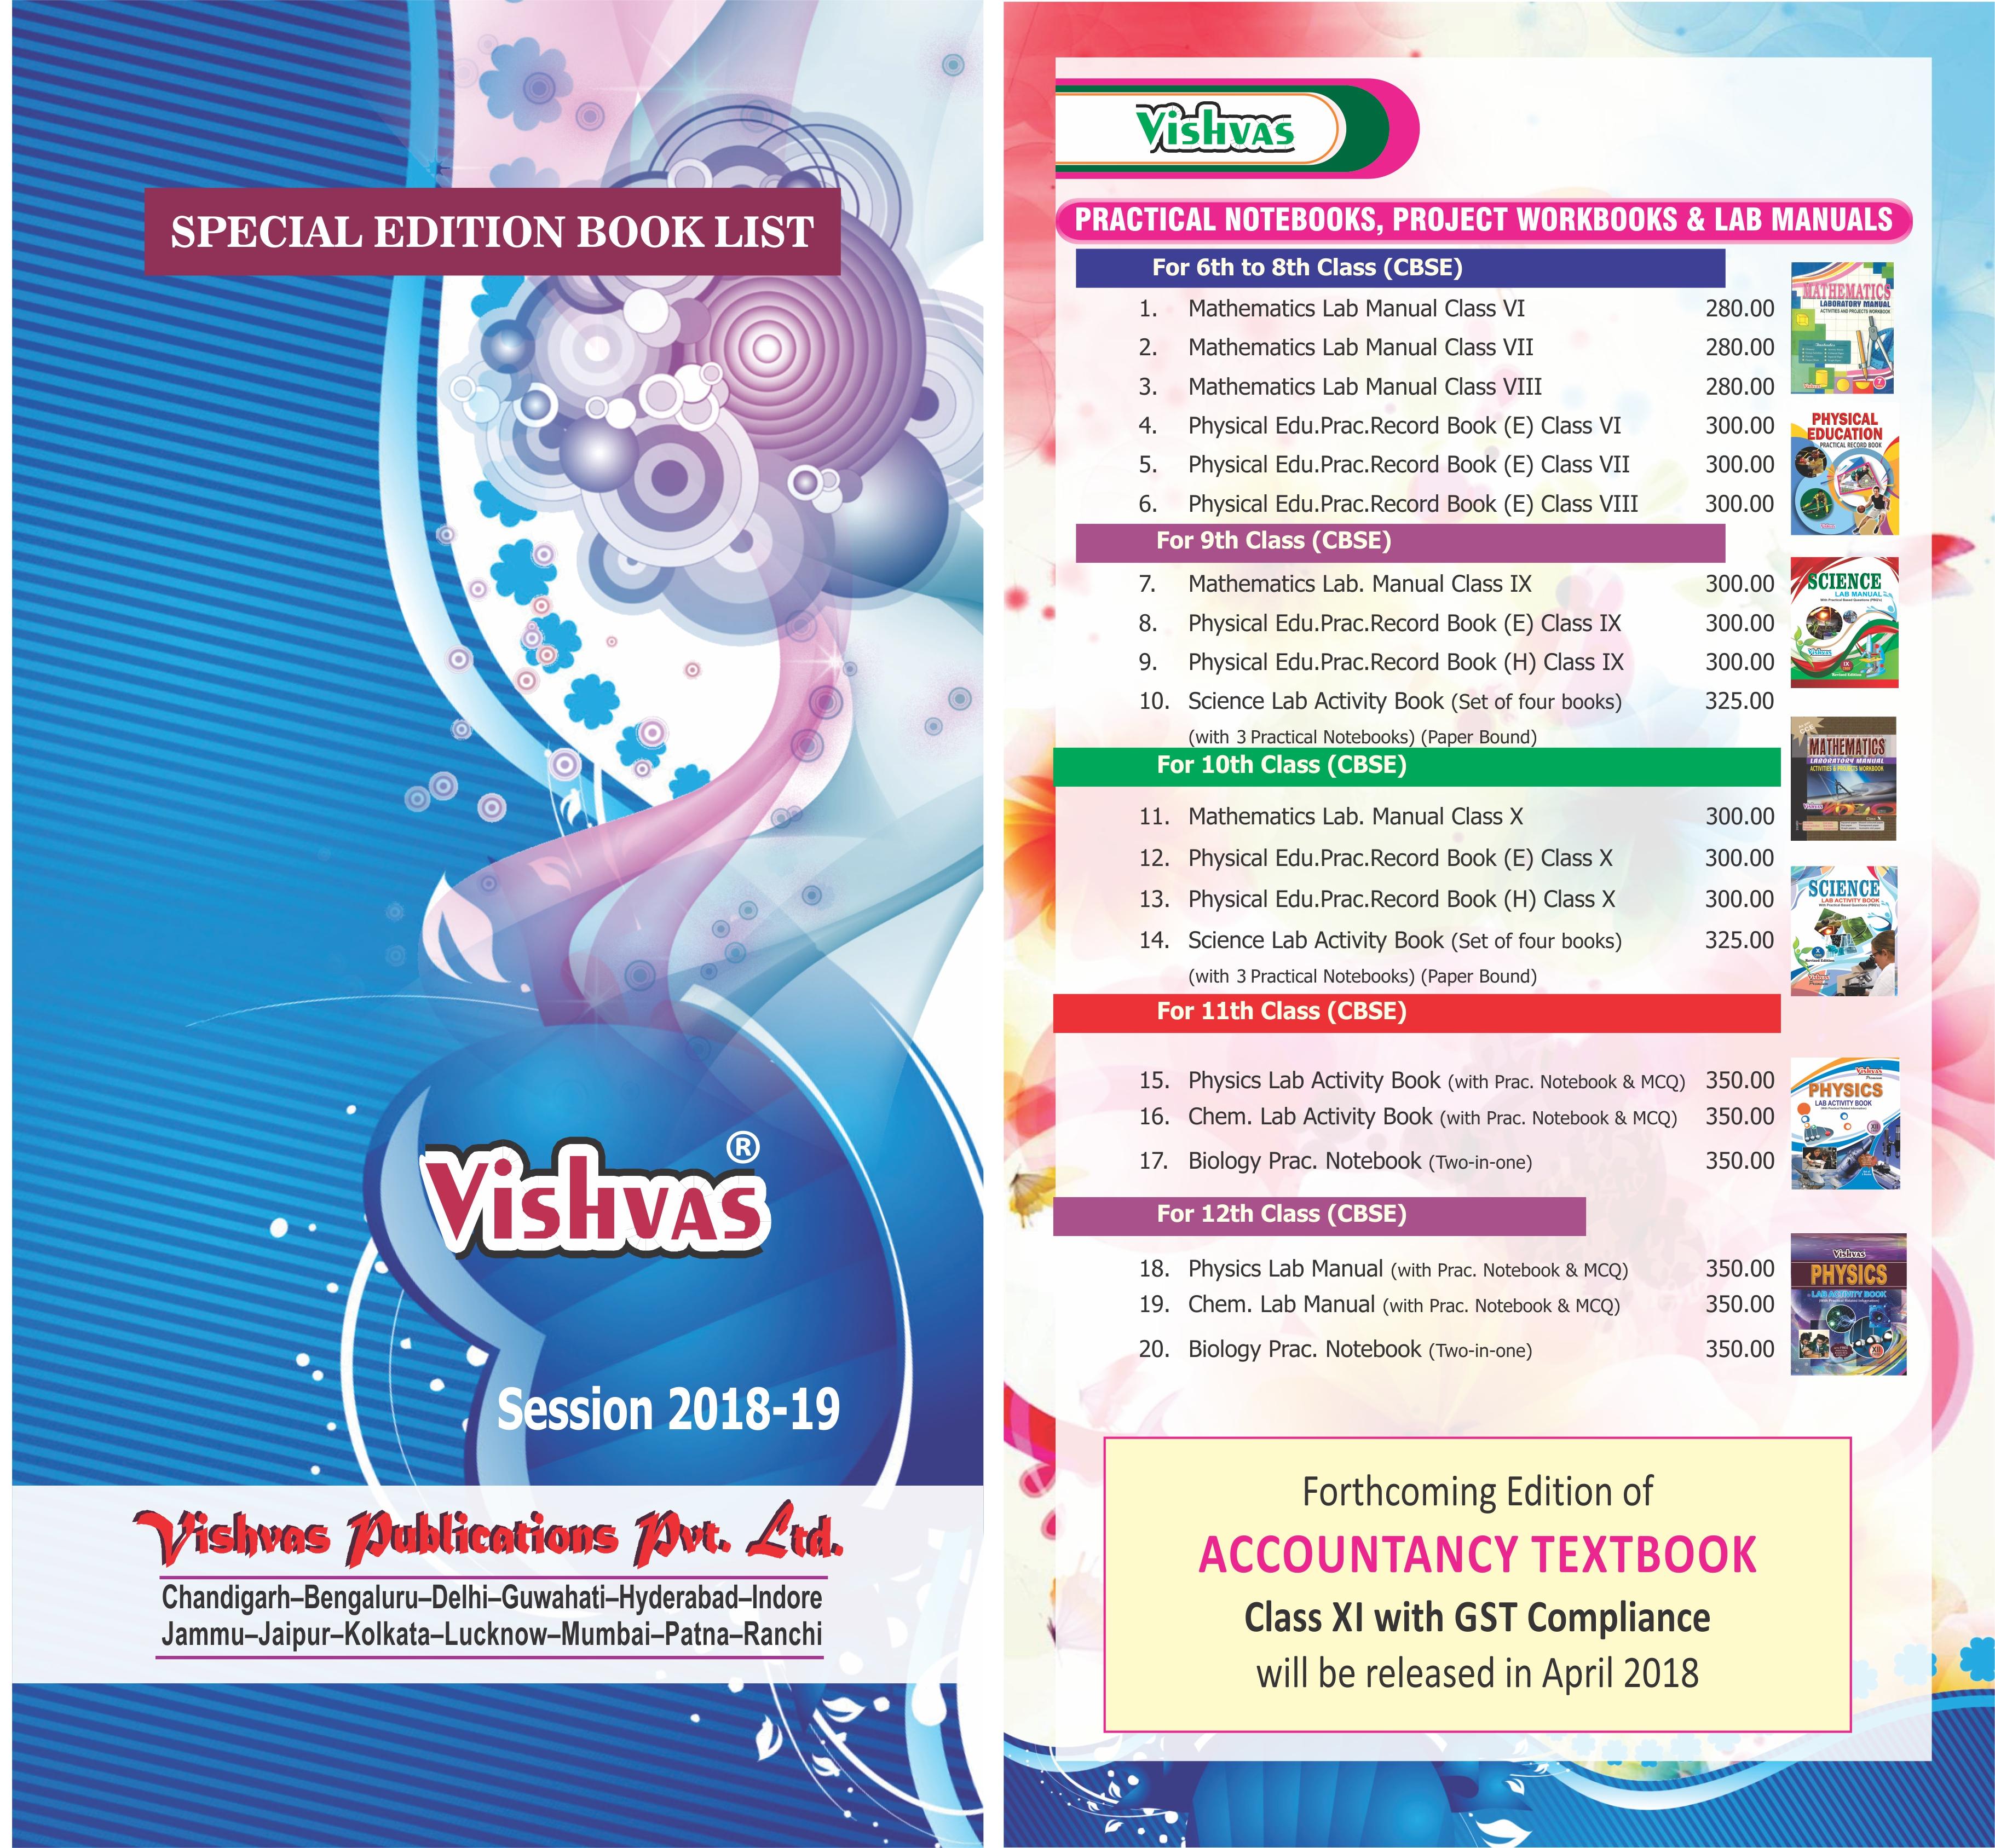 Physics lab manual 11th ebook array catalogue vishvas books rh vishvasbook com fandeluxe Images